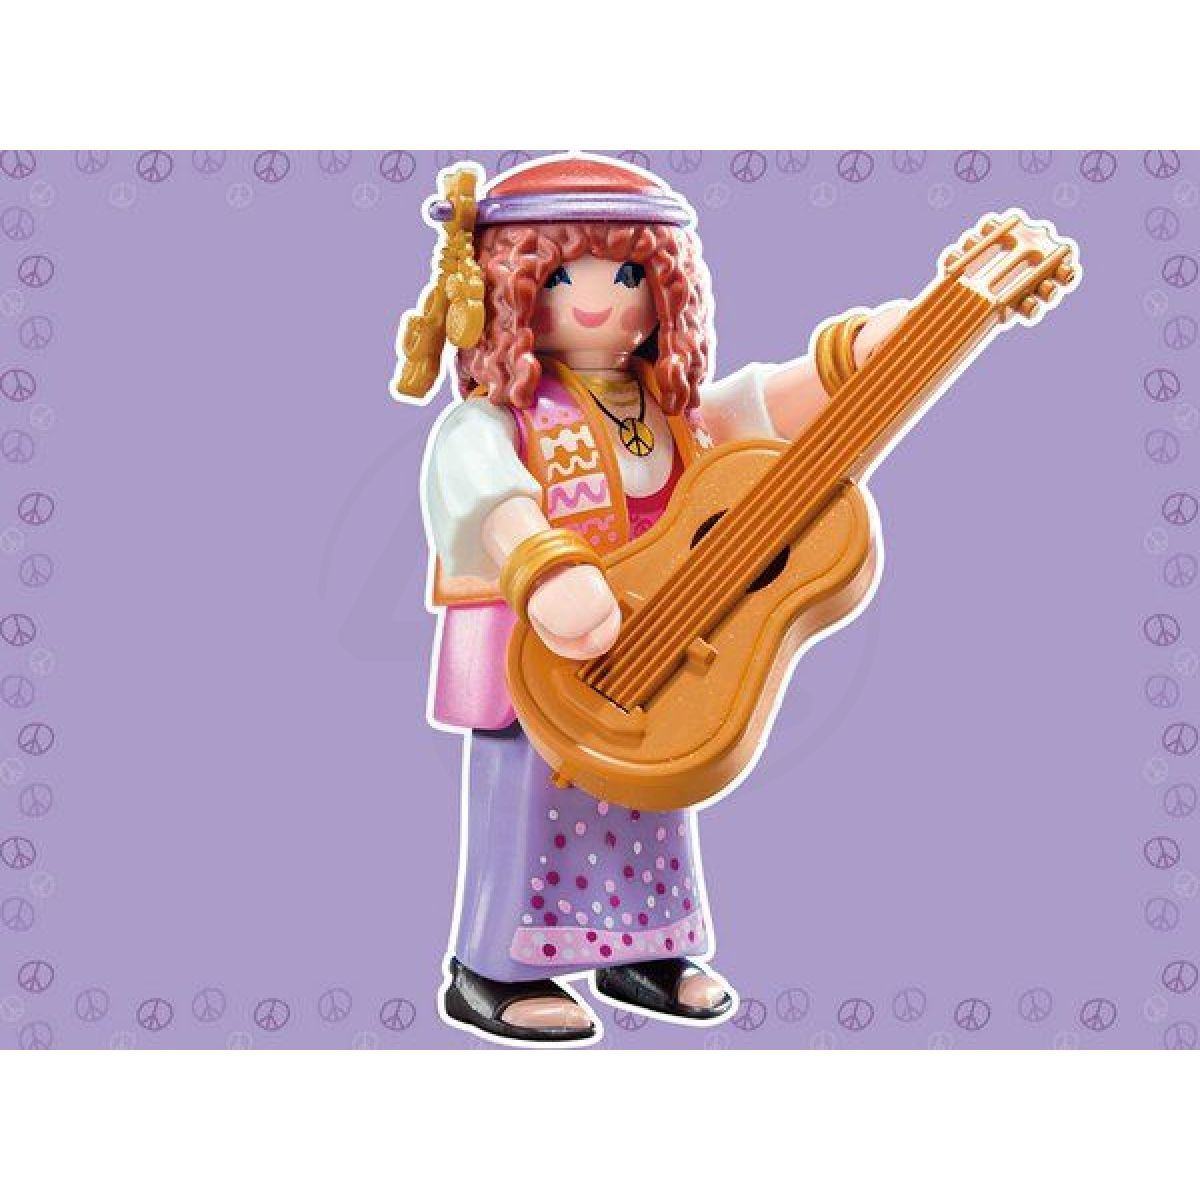 ... Playmobil 9147 Figurky pro dívky série 11 3 ... d1cc17e251